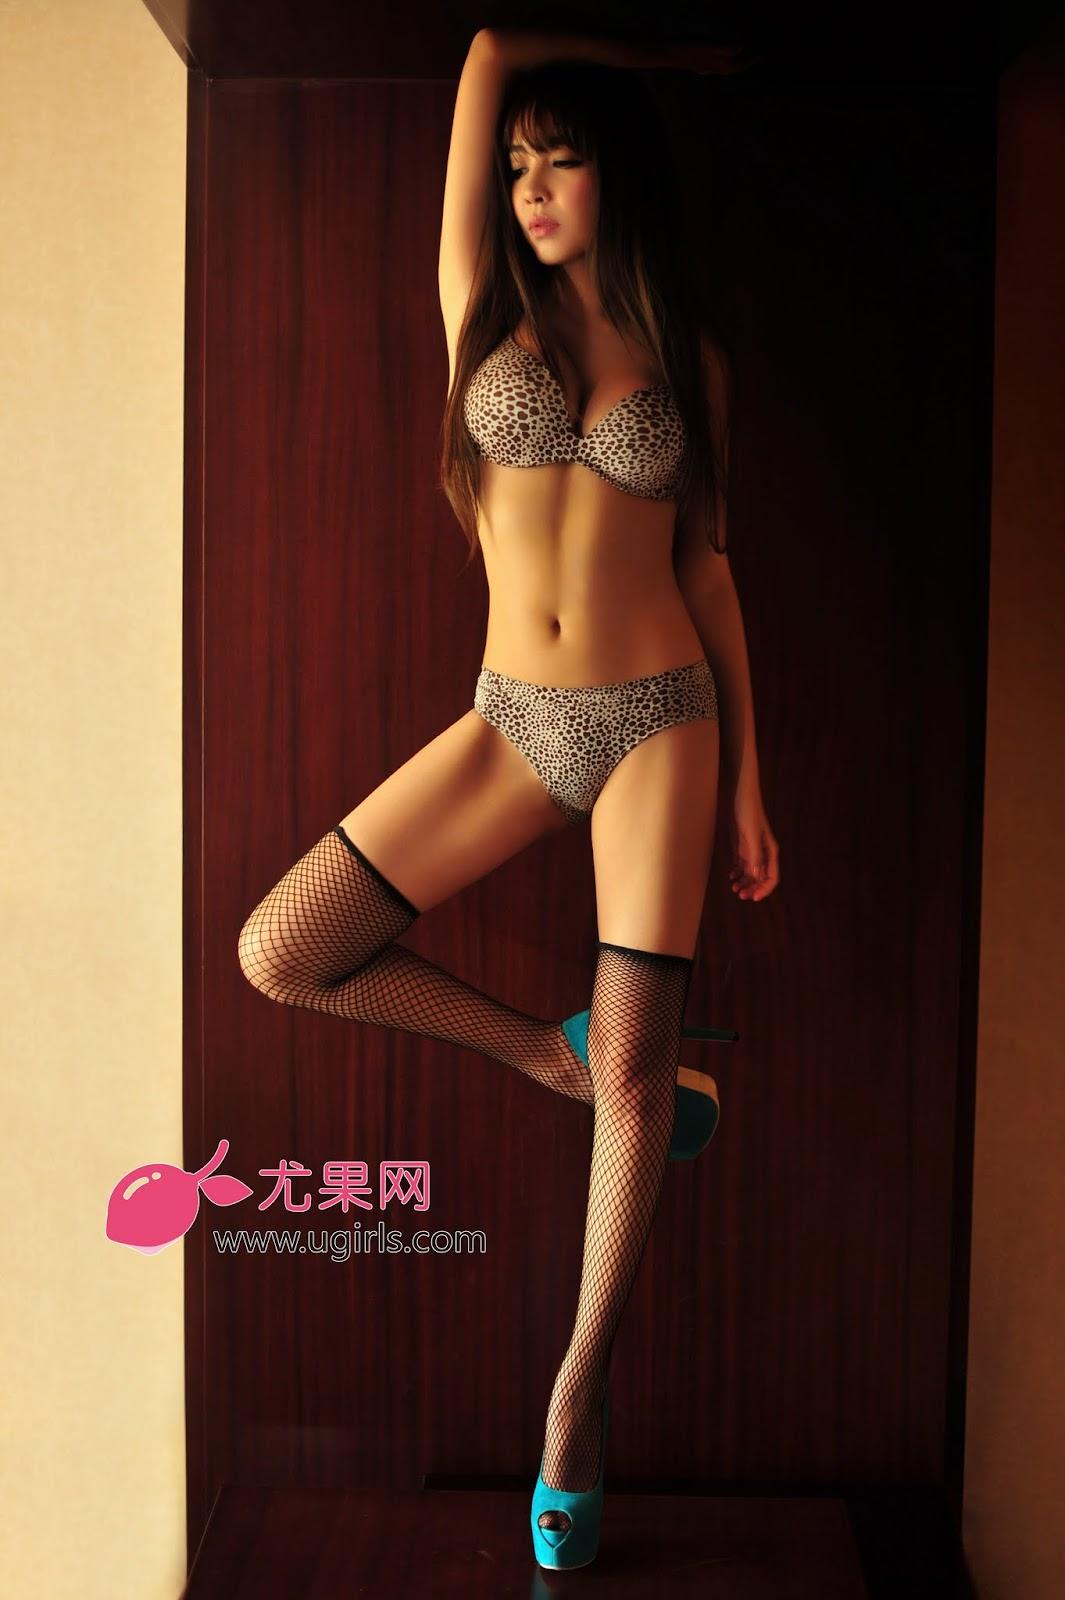 DLS 4712 - Hot Girl Model UGIRLS NO.13